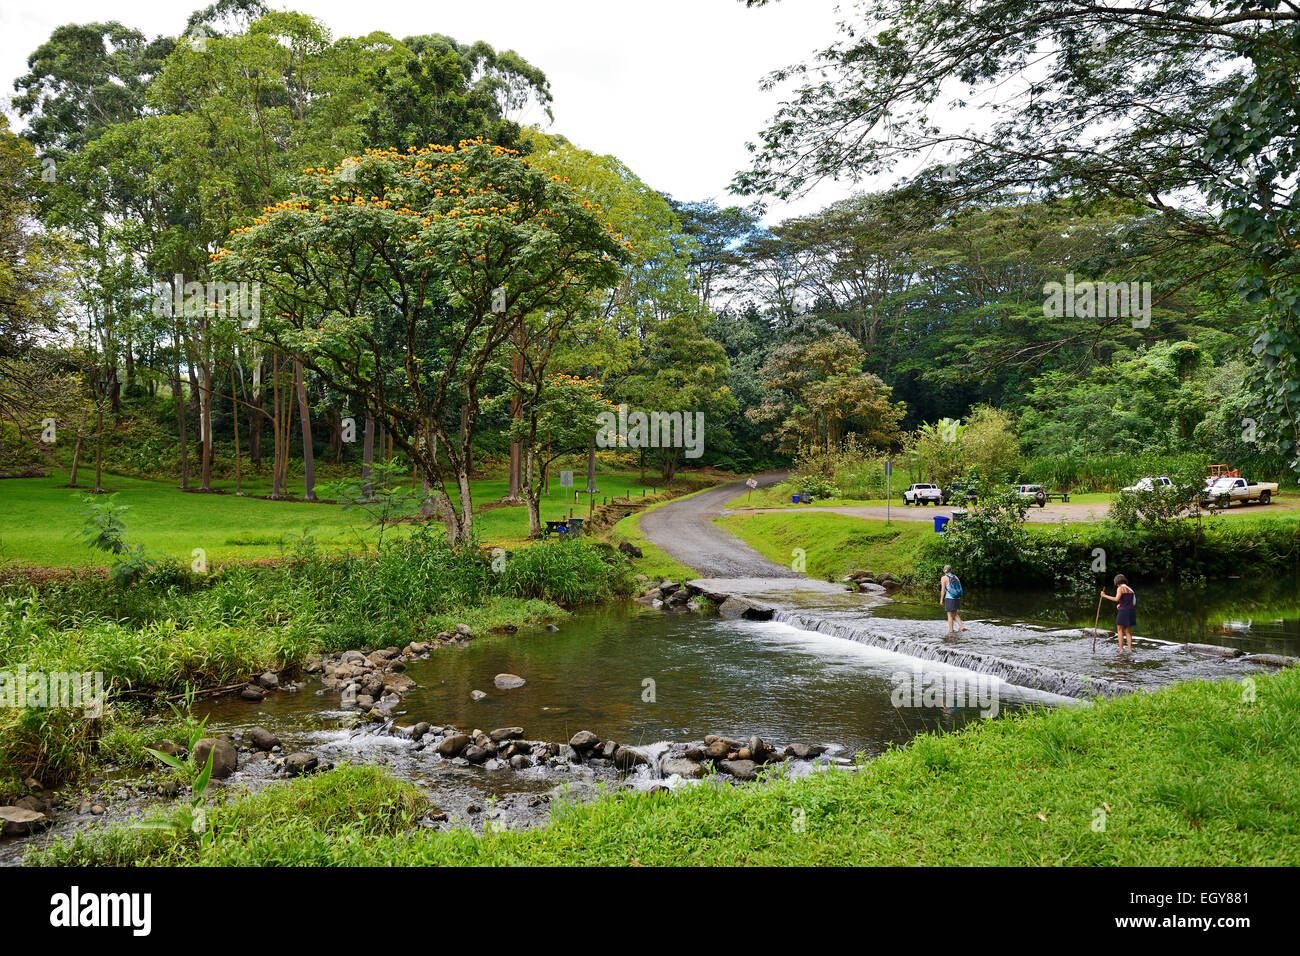 River crossing at picnic area in Keahua Forestry Arboretum (part of Wailua River State Park), Kauai, Hawaii, USA - Stock Image